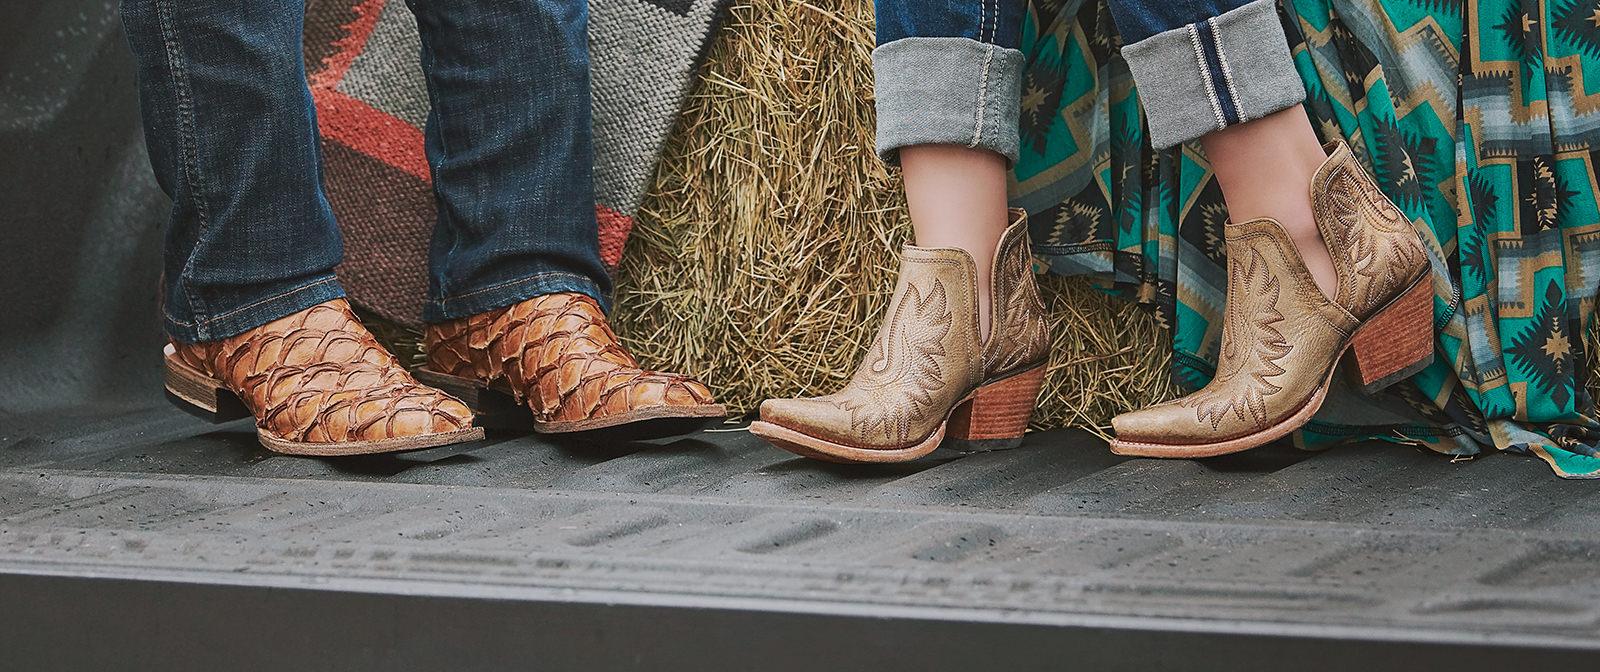 046a6f7d7a7b Shop Cowboy Boots   Western Wear